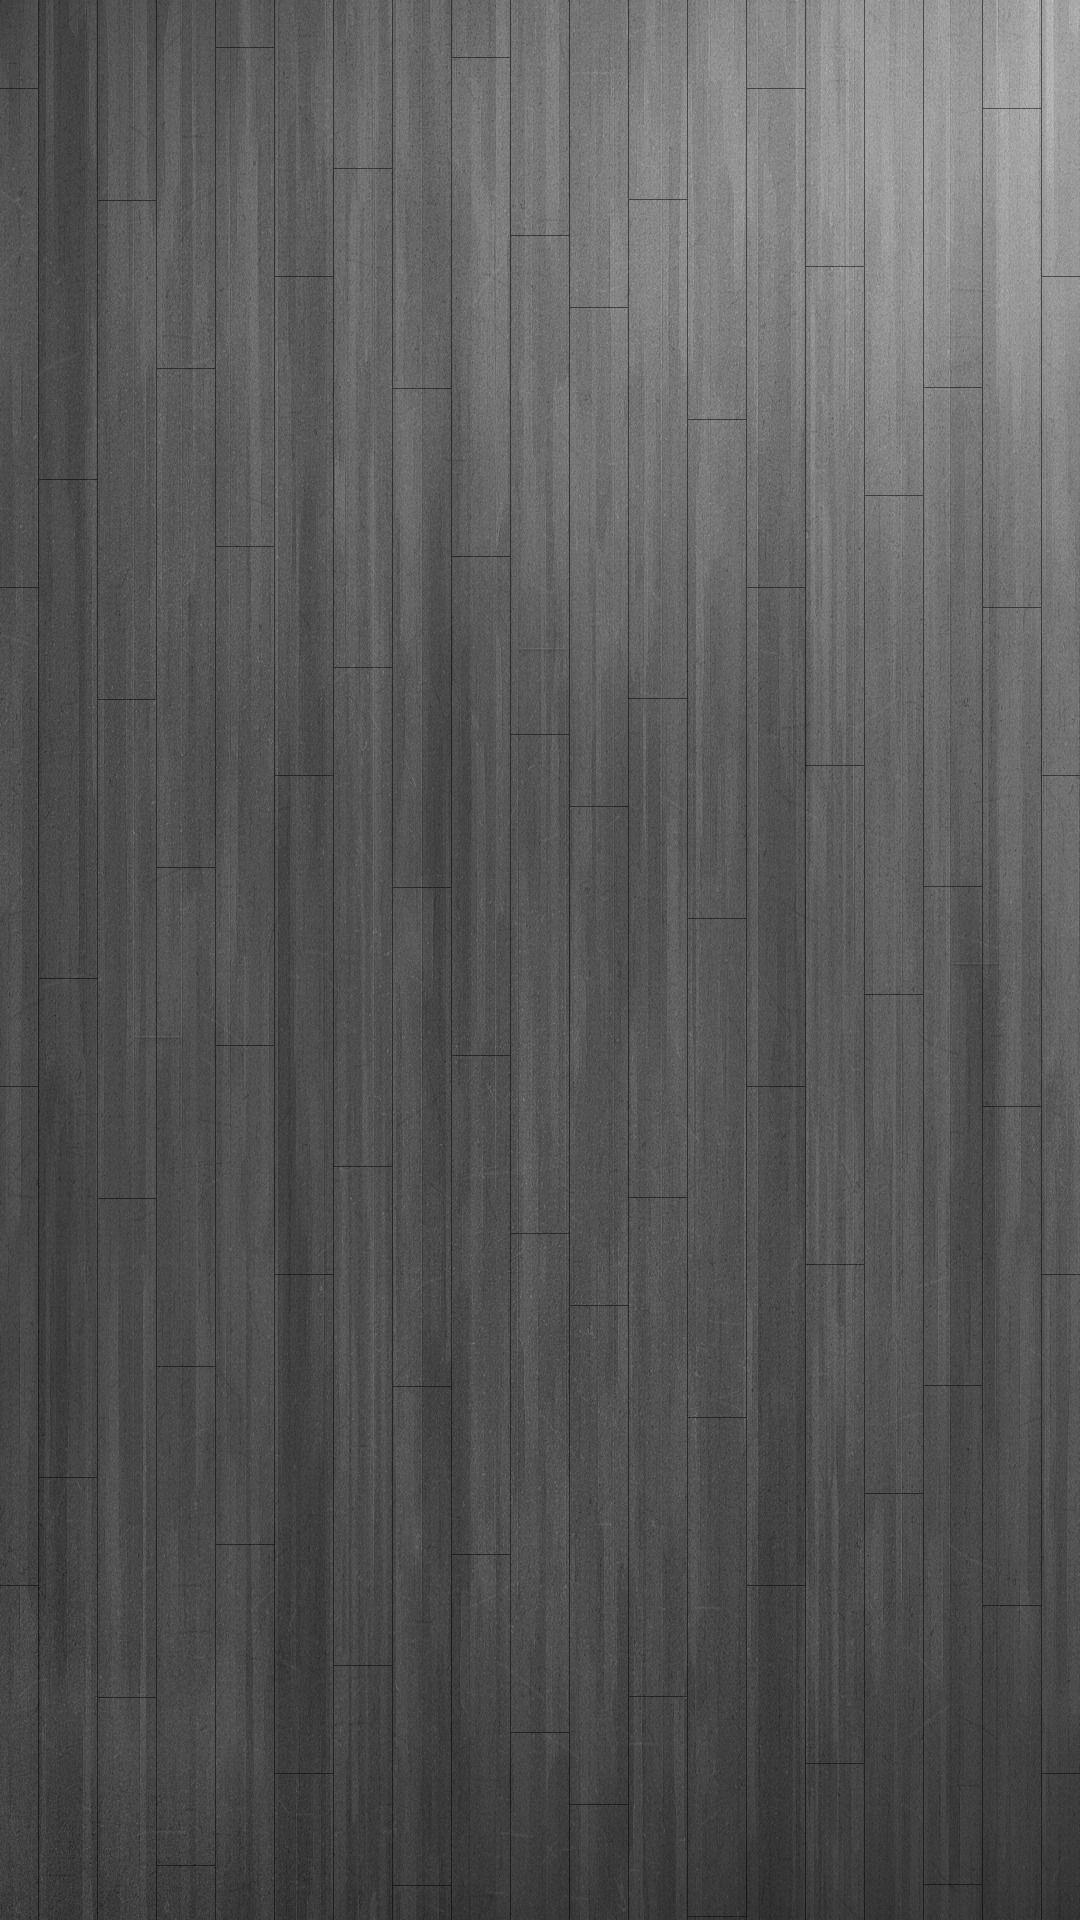 Iphone Ios 7 Wallpaper Tumblr For Ipad Duvar Kagidi Duvar